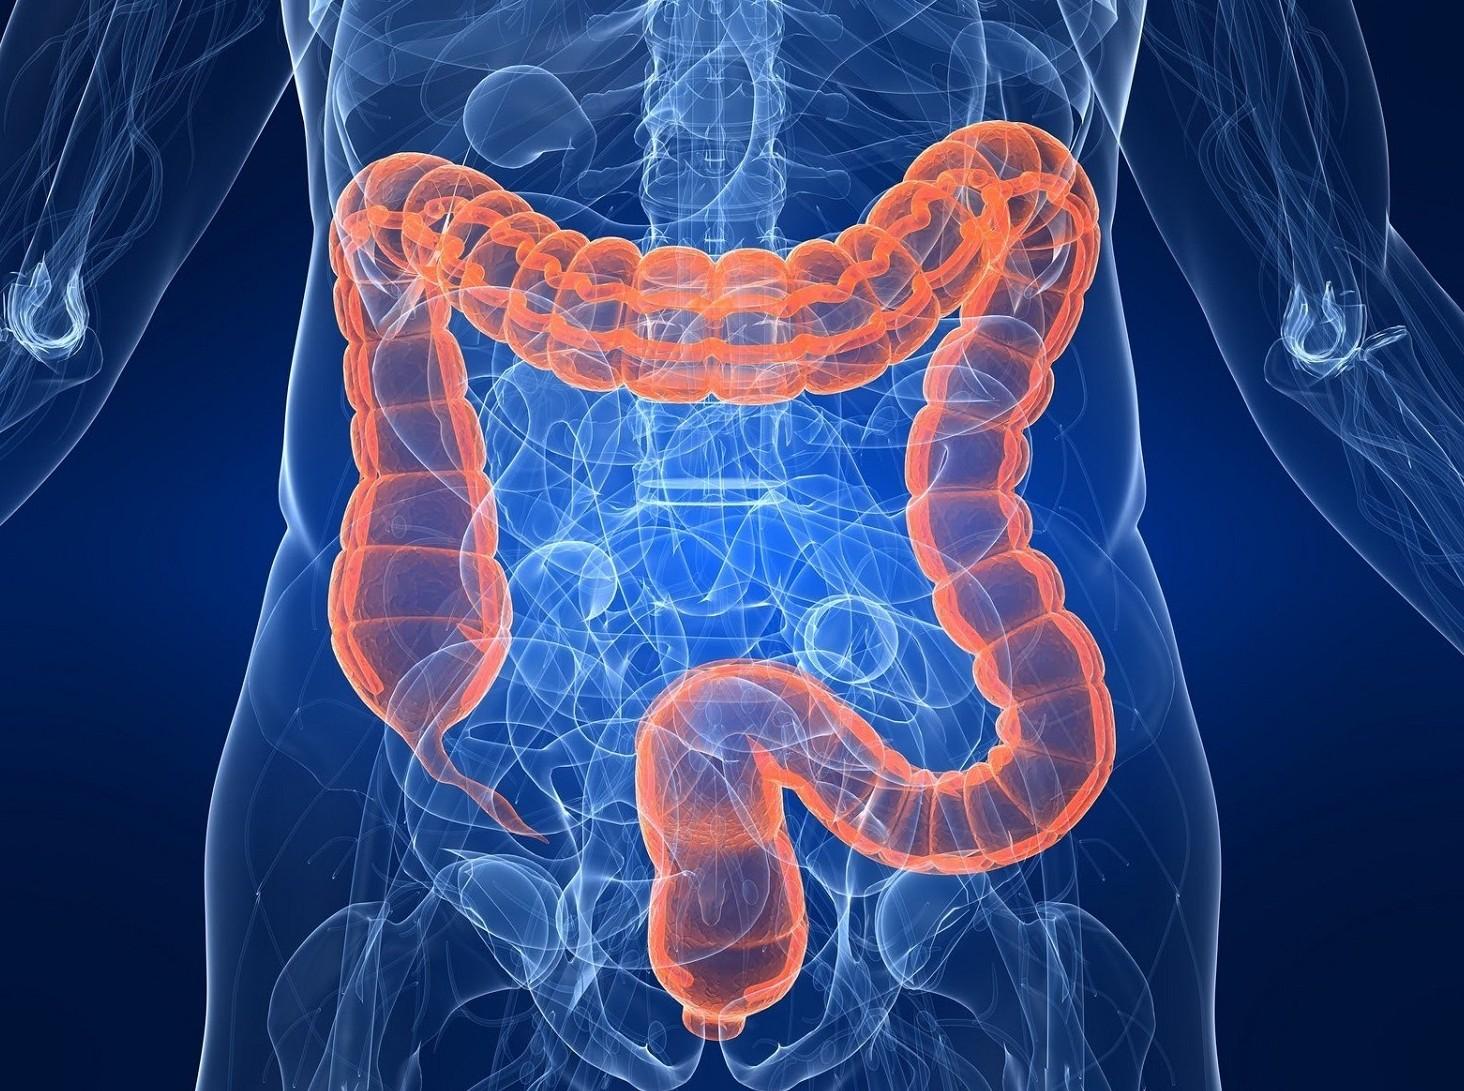 Dieta: intestino è fondamentale per una